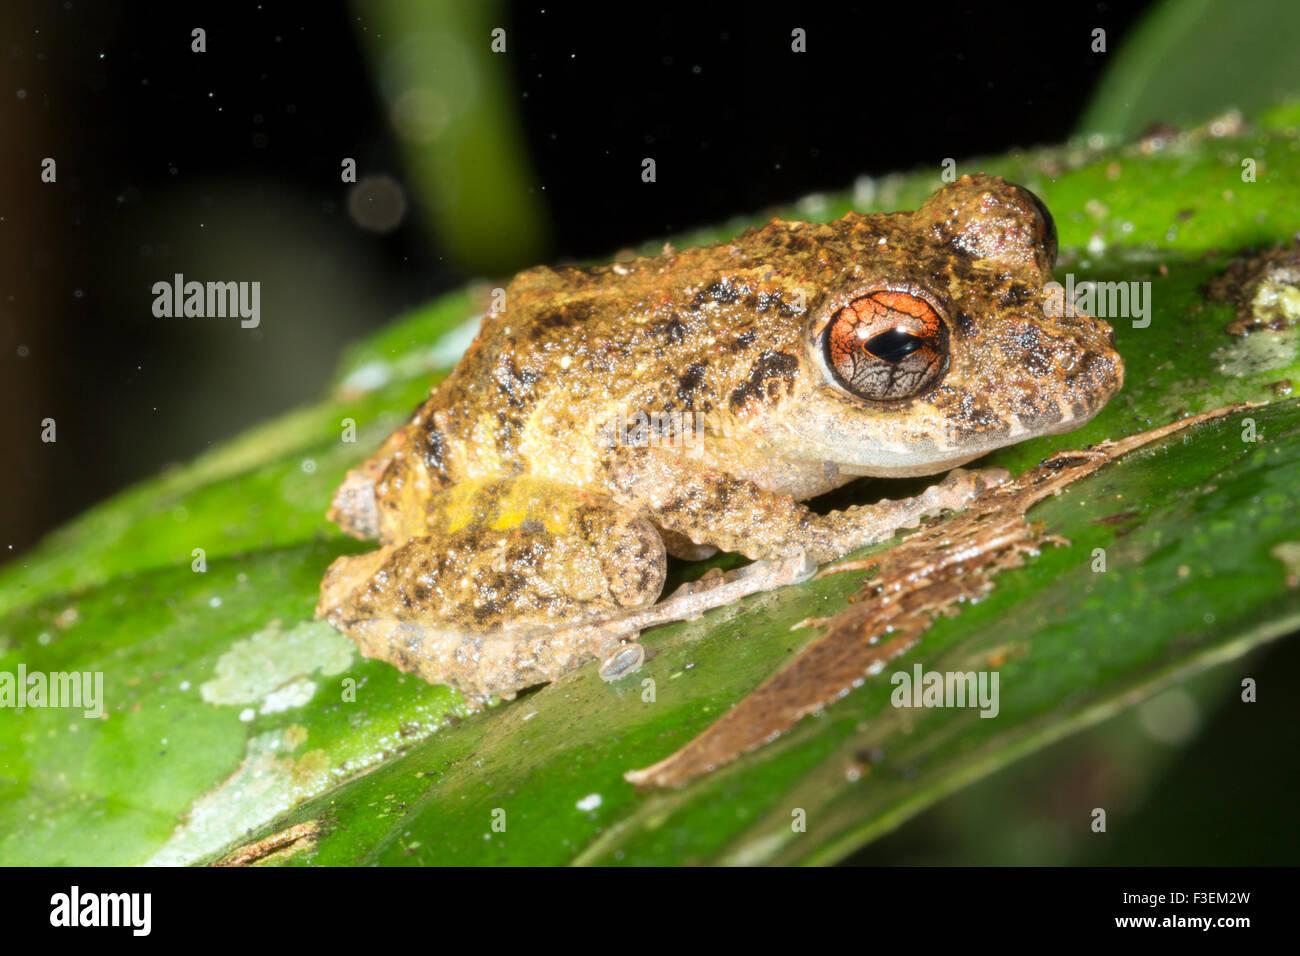 Warty Diadem Rain Frog (Pristimantis diadematus) in rainforest, Ecuador - Stock Image